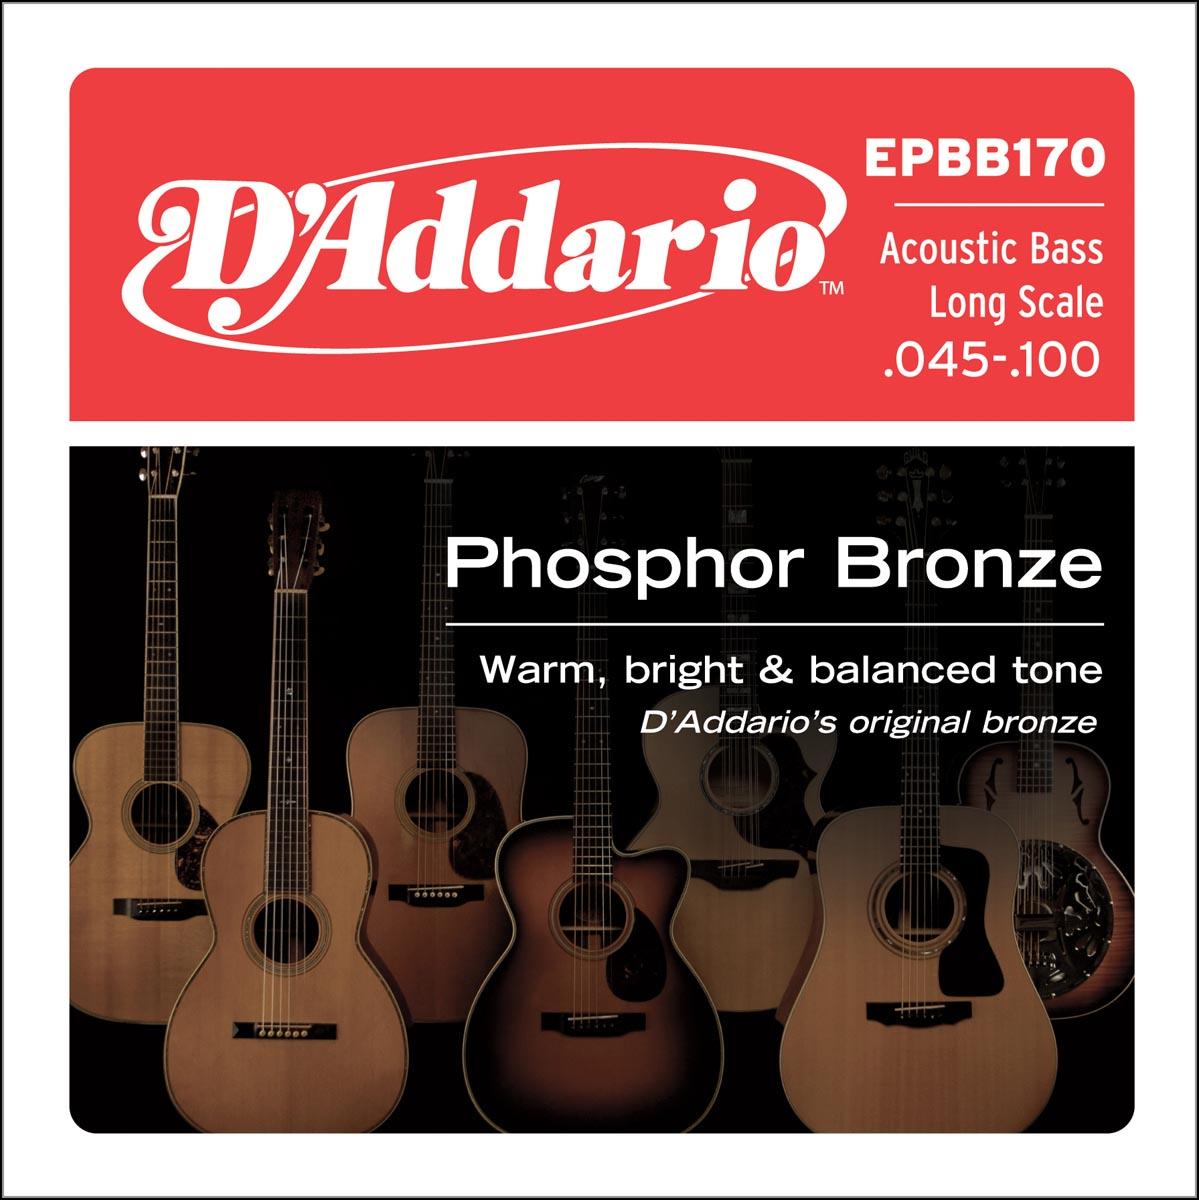 DADDARIO EPBB170 PHOSPHOR BRONZE ACOUSTIC BASS, LONG SCALE [45-100]